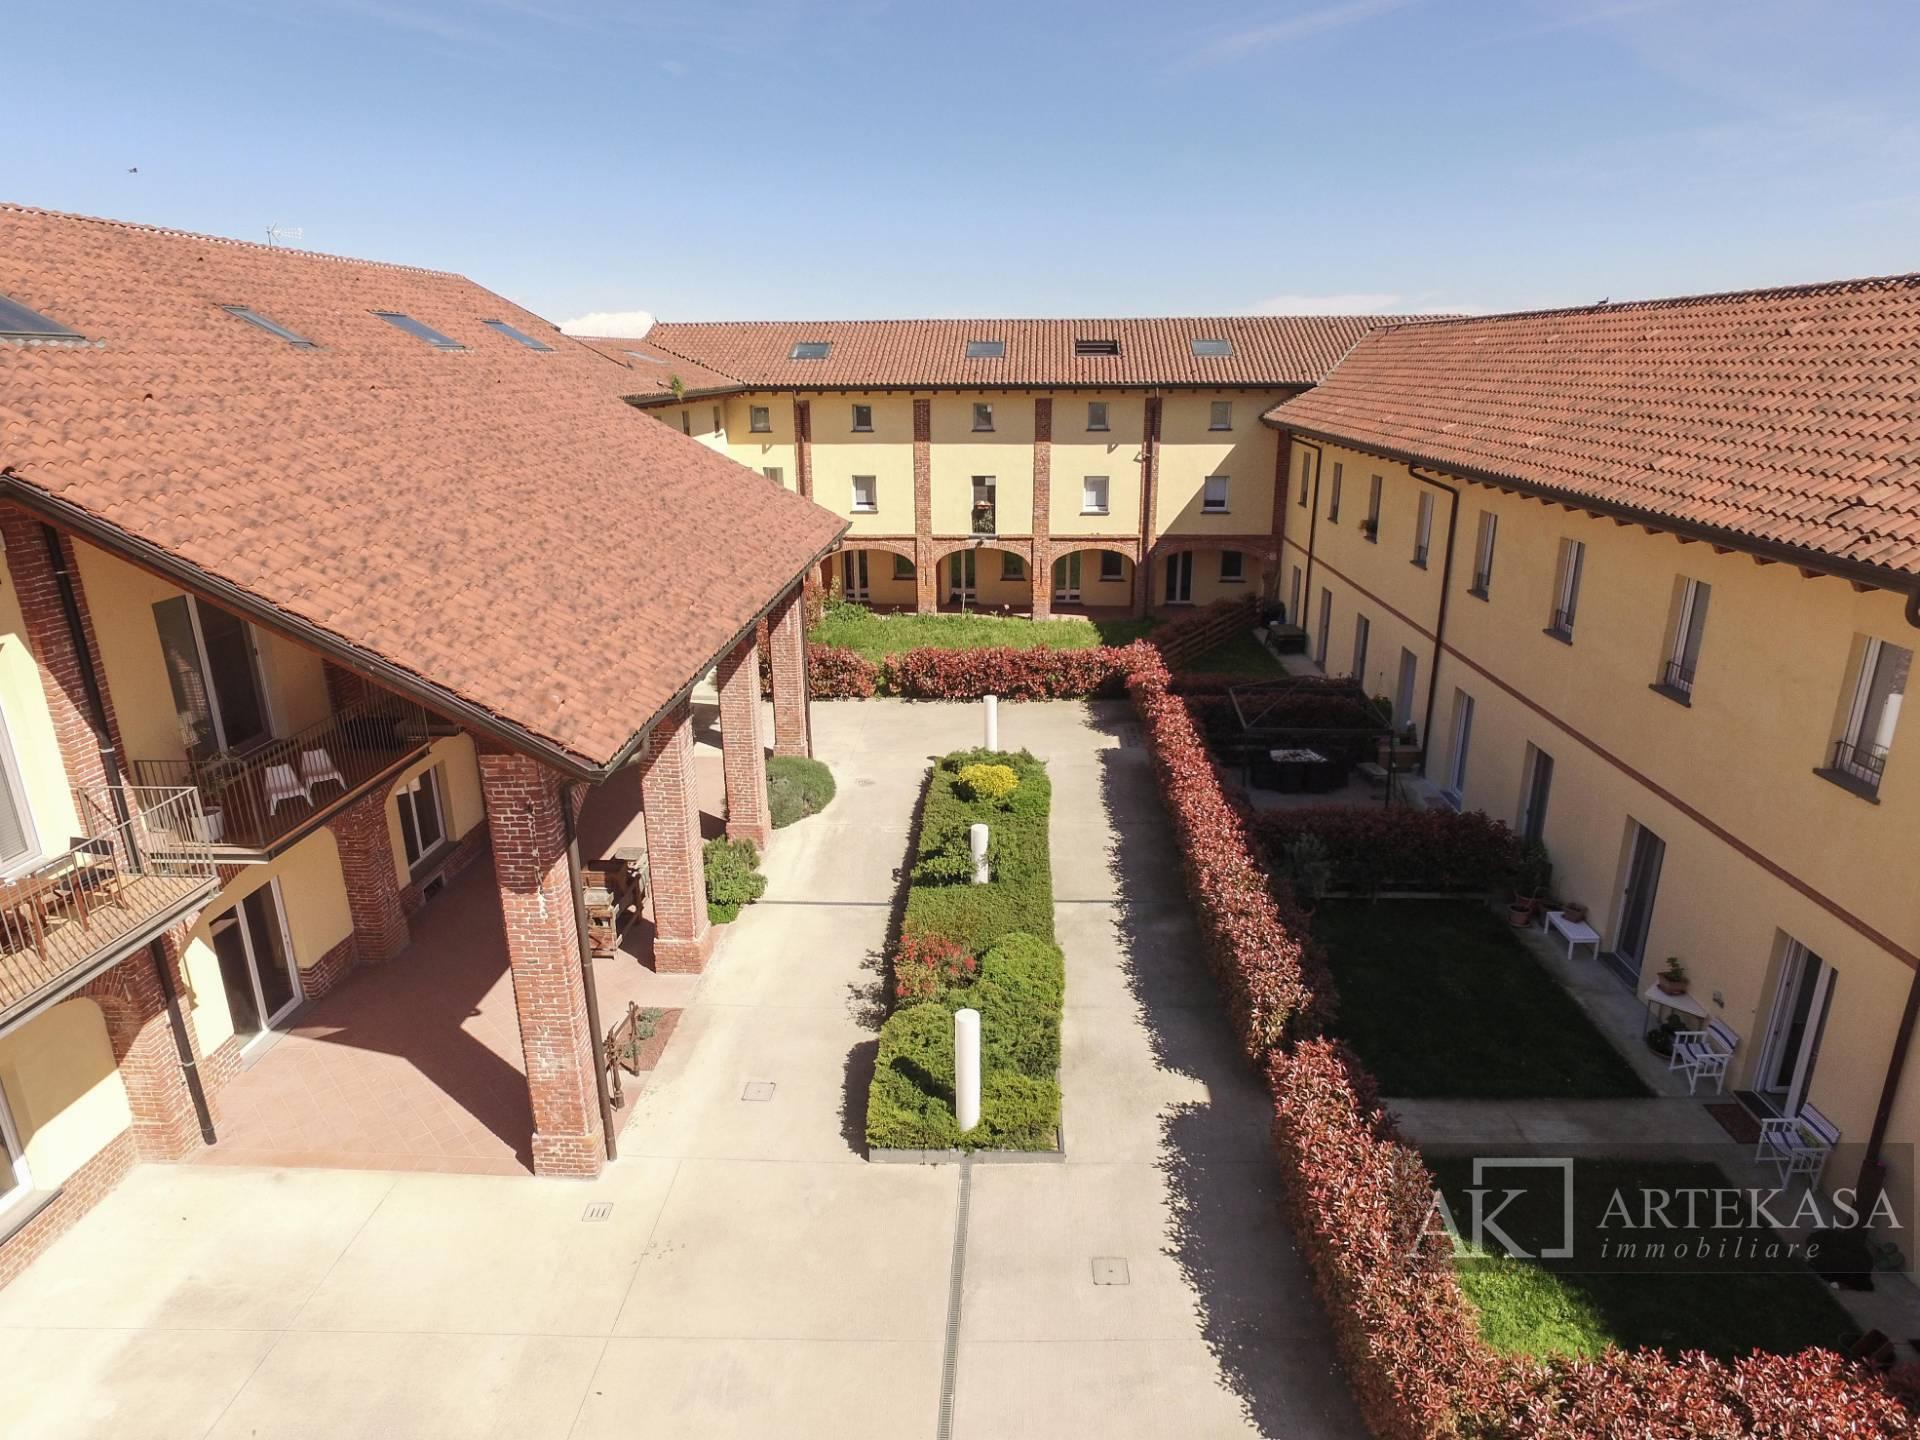 3 Locali Giardino Novara - Cittadella - Villaggio Dalmazia - Torrion Quartara